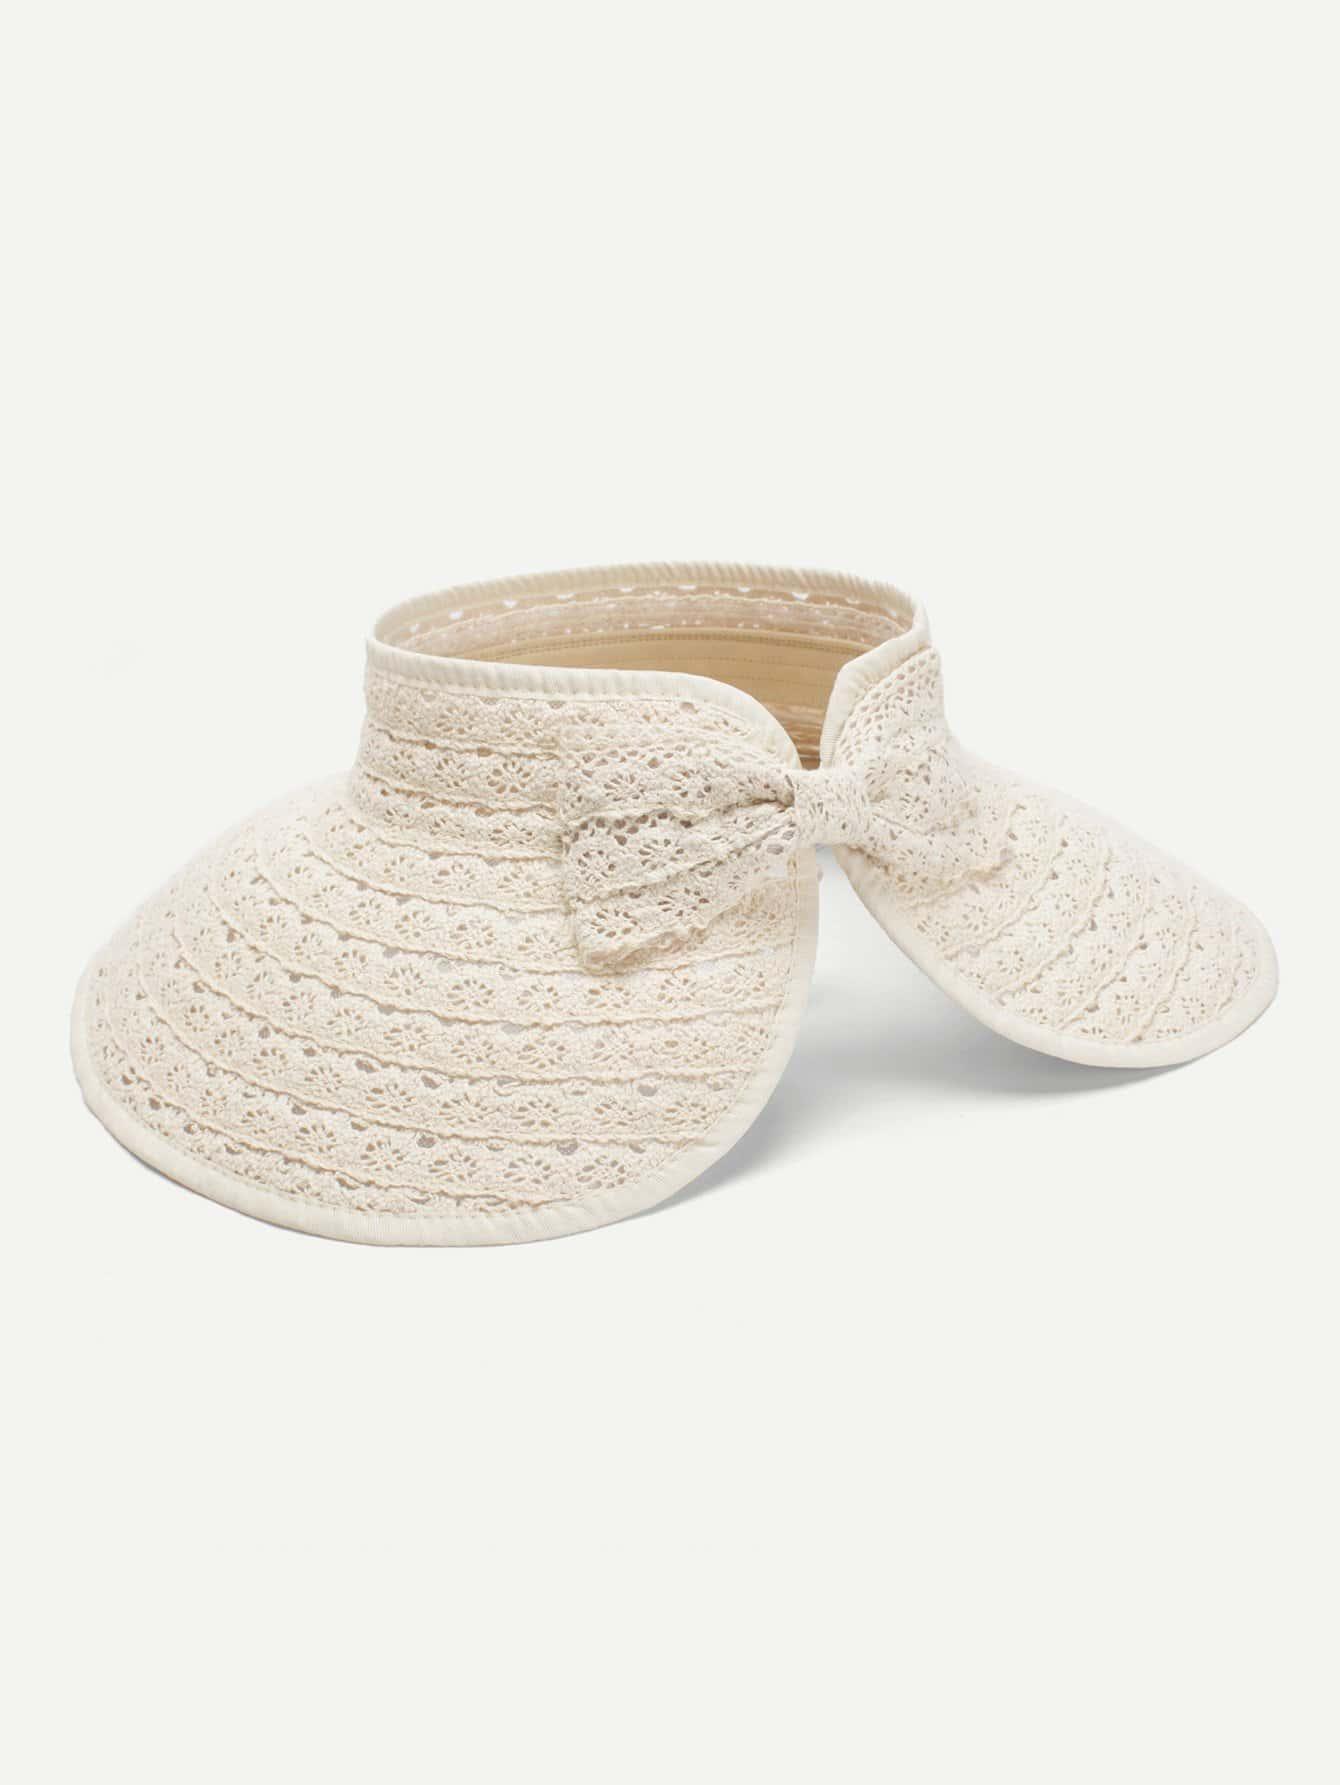 Crochet Visor Hat With Velcro hot winter beanie knit crochet ski hat plicate baggy oversized slouch unisex cap